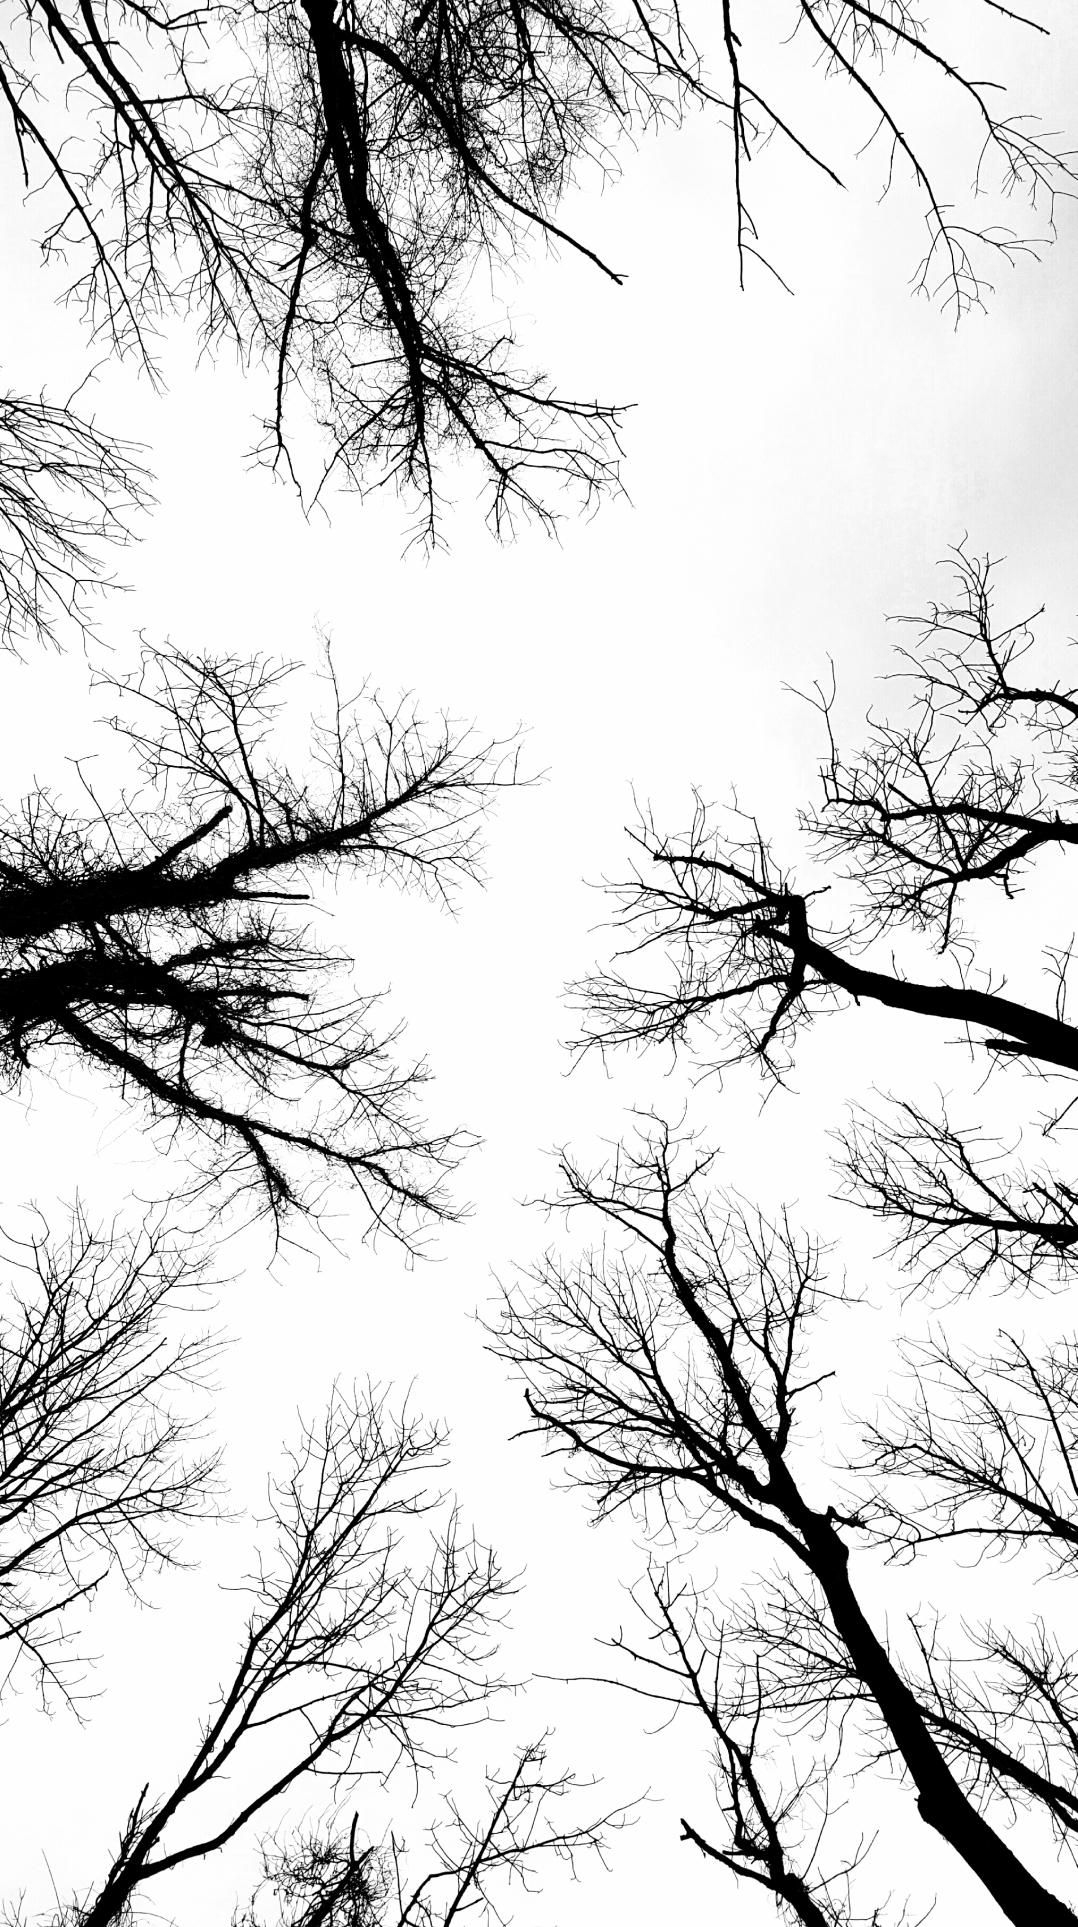 trees-that-looks-like-neurons-1